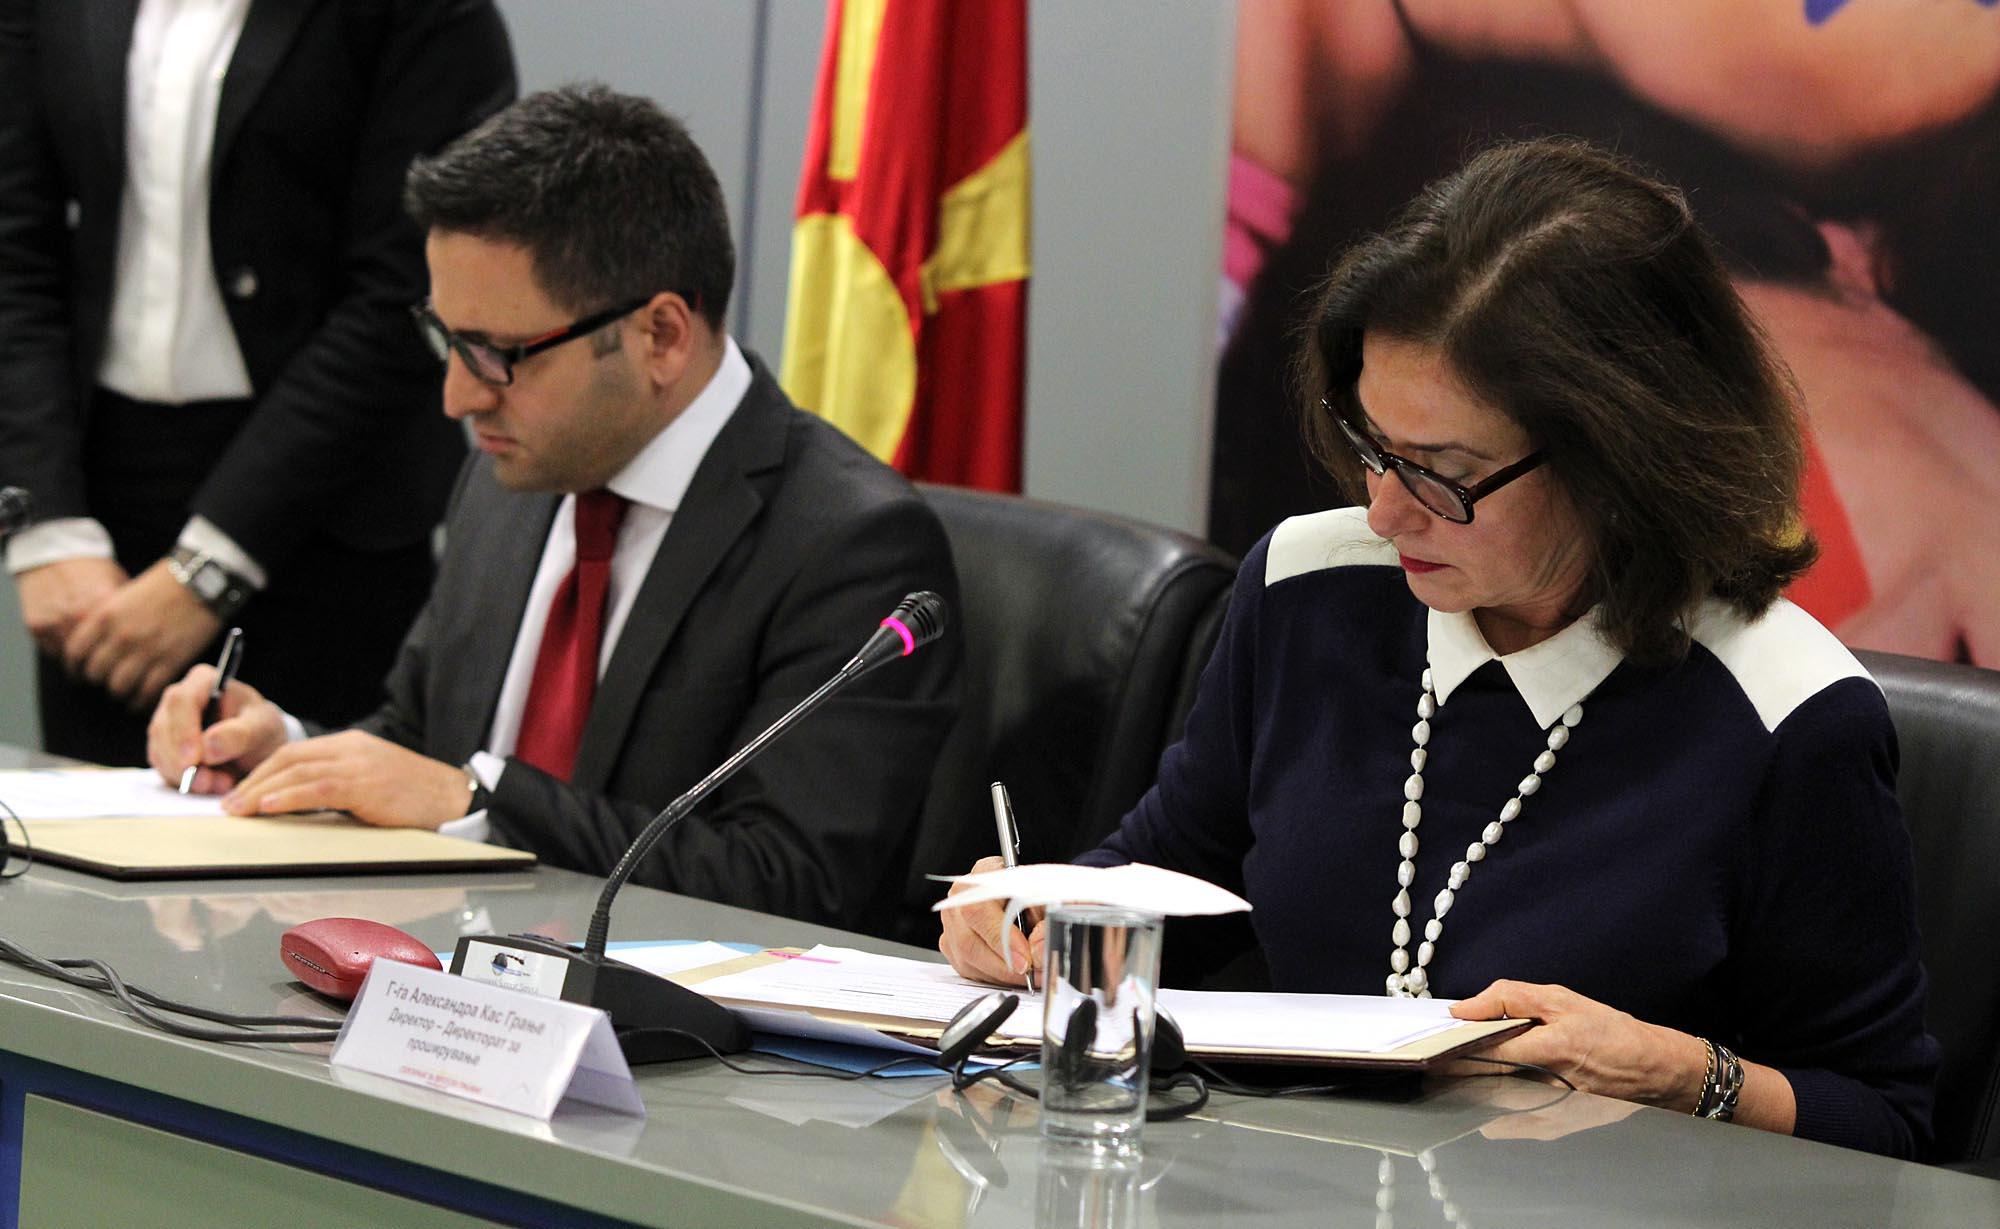 European Commission allocates 30 million Euros for cross border cooperation